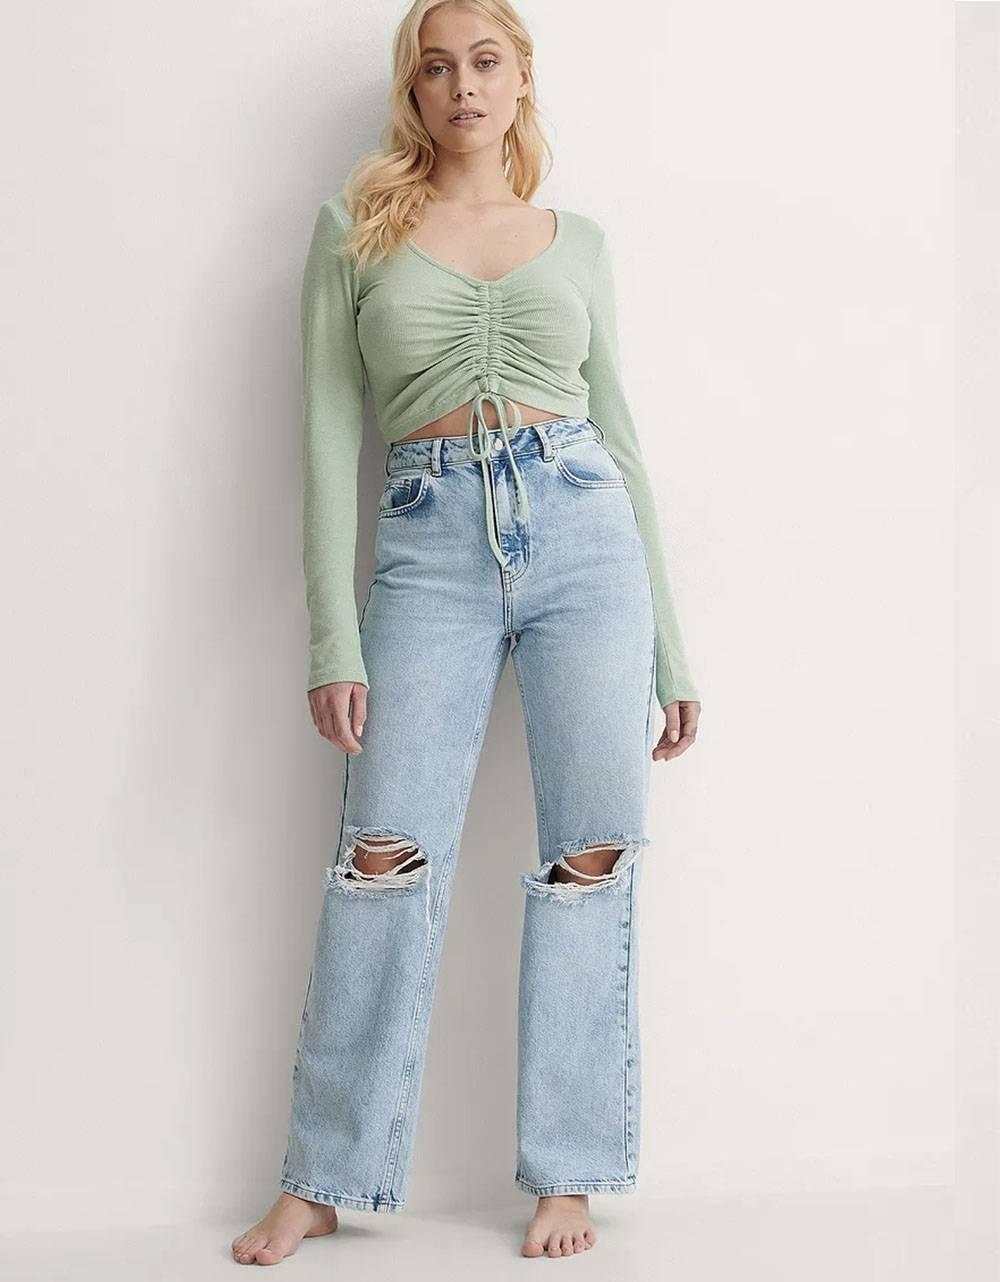 NA-KD wide leg denim - light blue NA-KD Jeans 65,00€